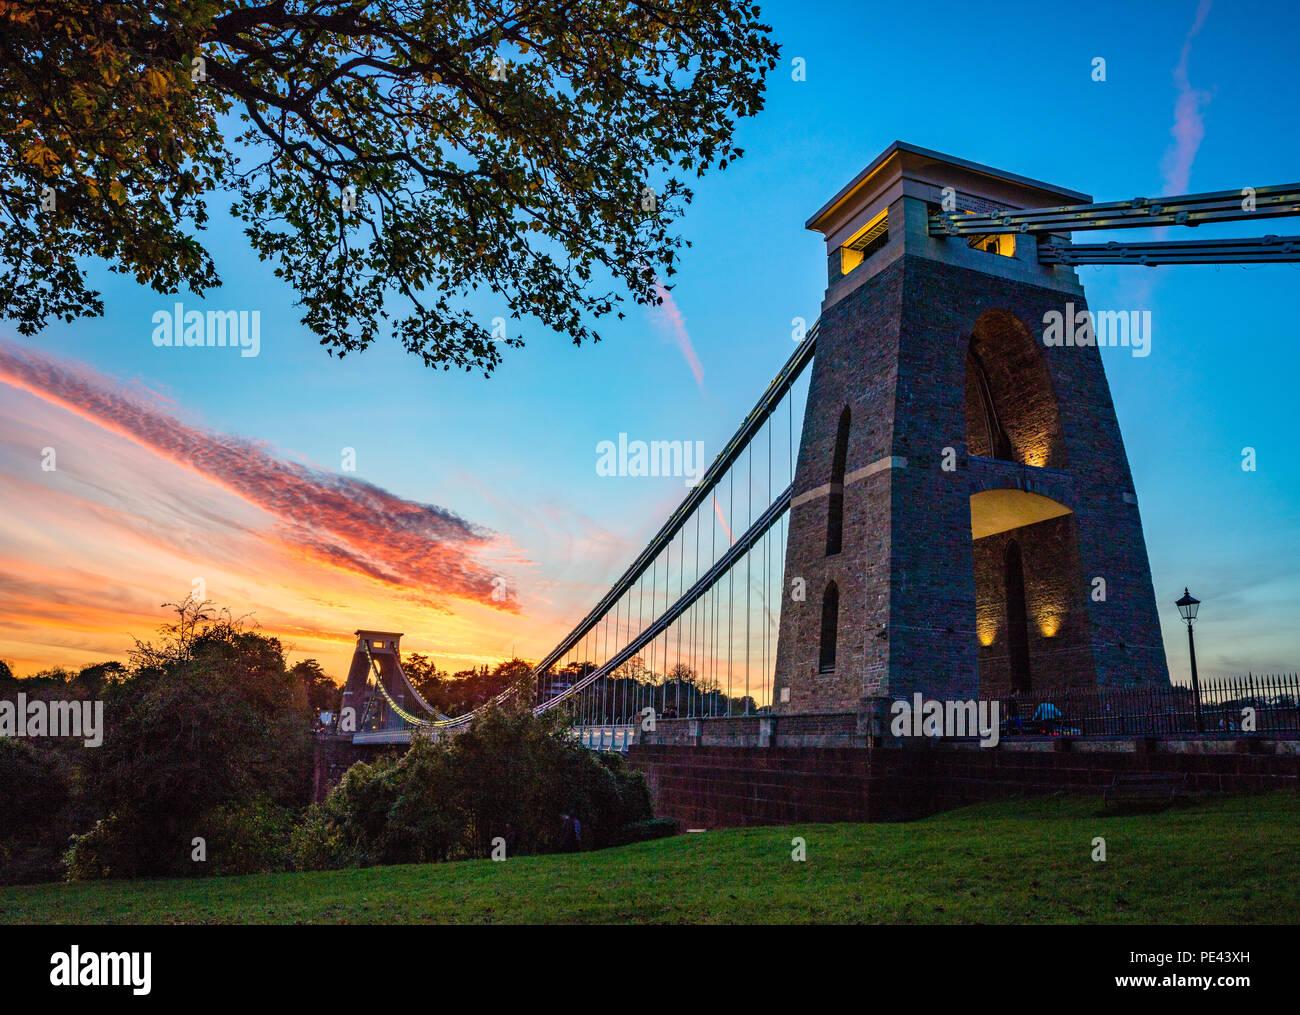 Clifton suspension bridge at dusk - Bristol UK - Stock Image